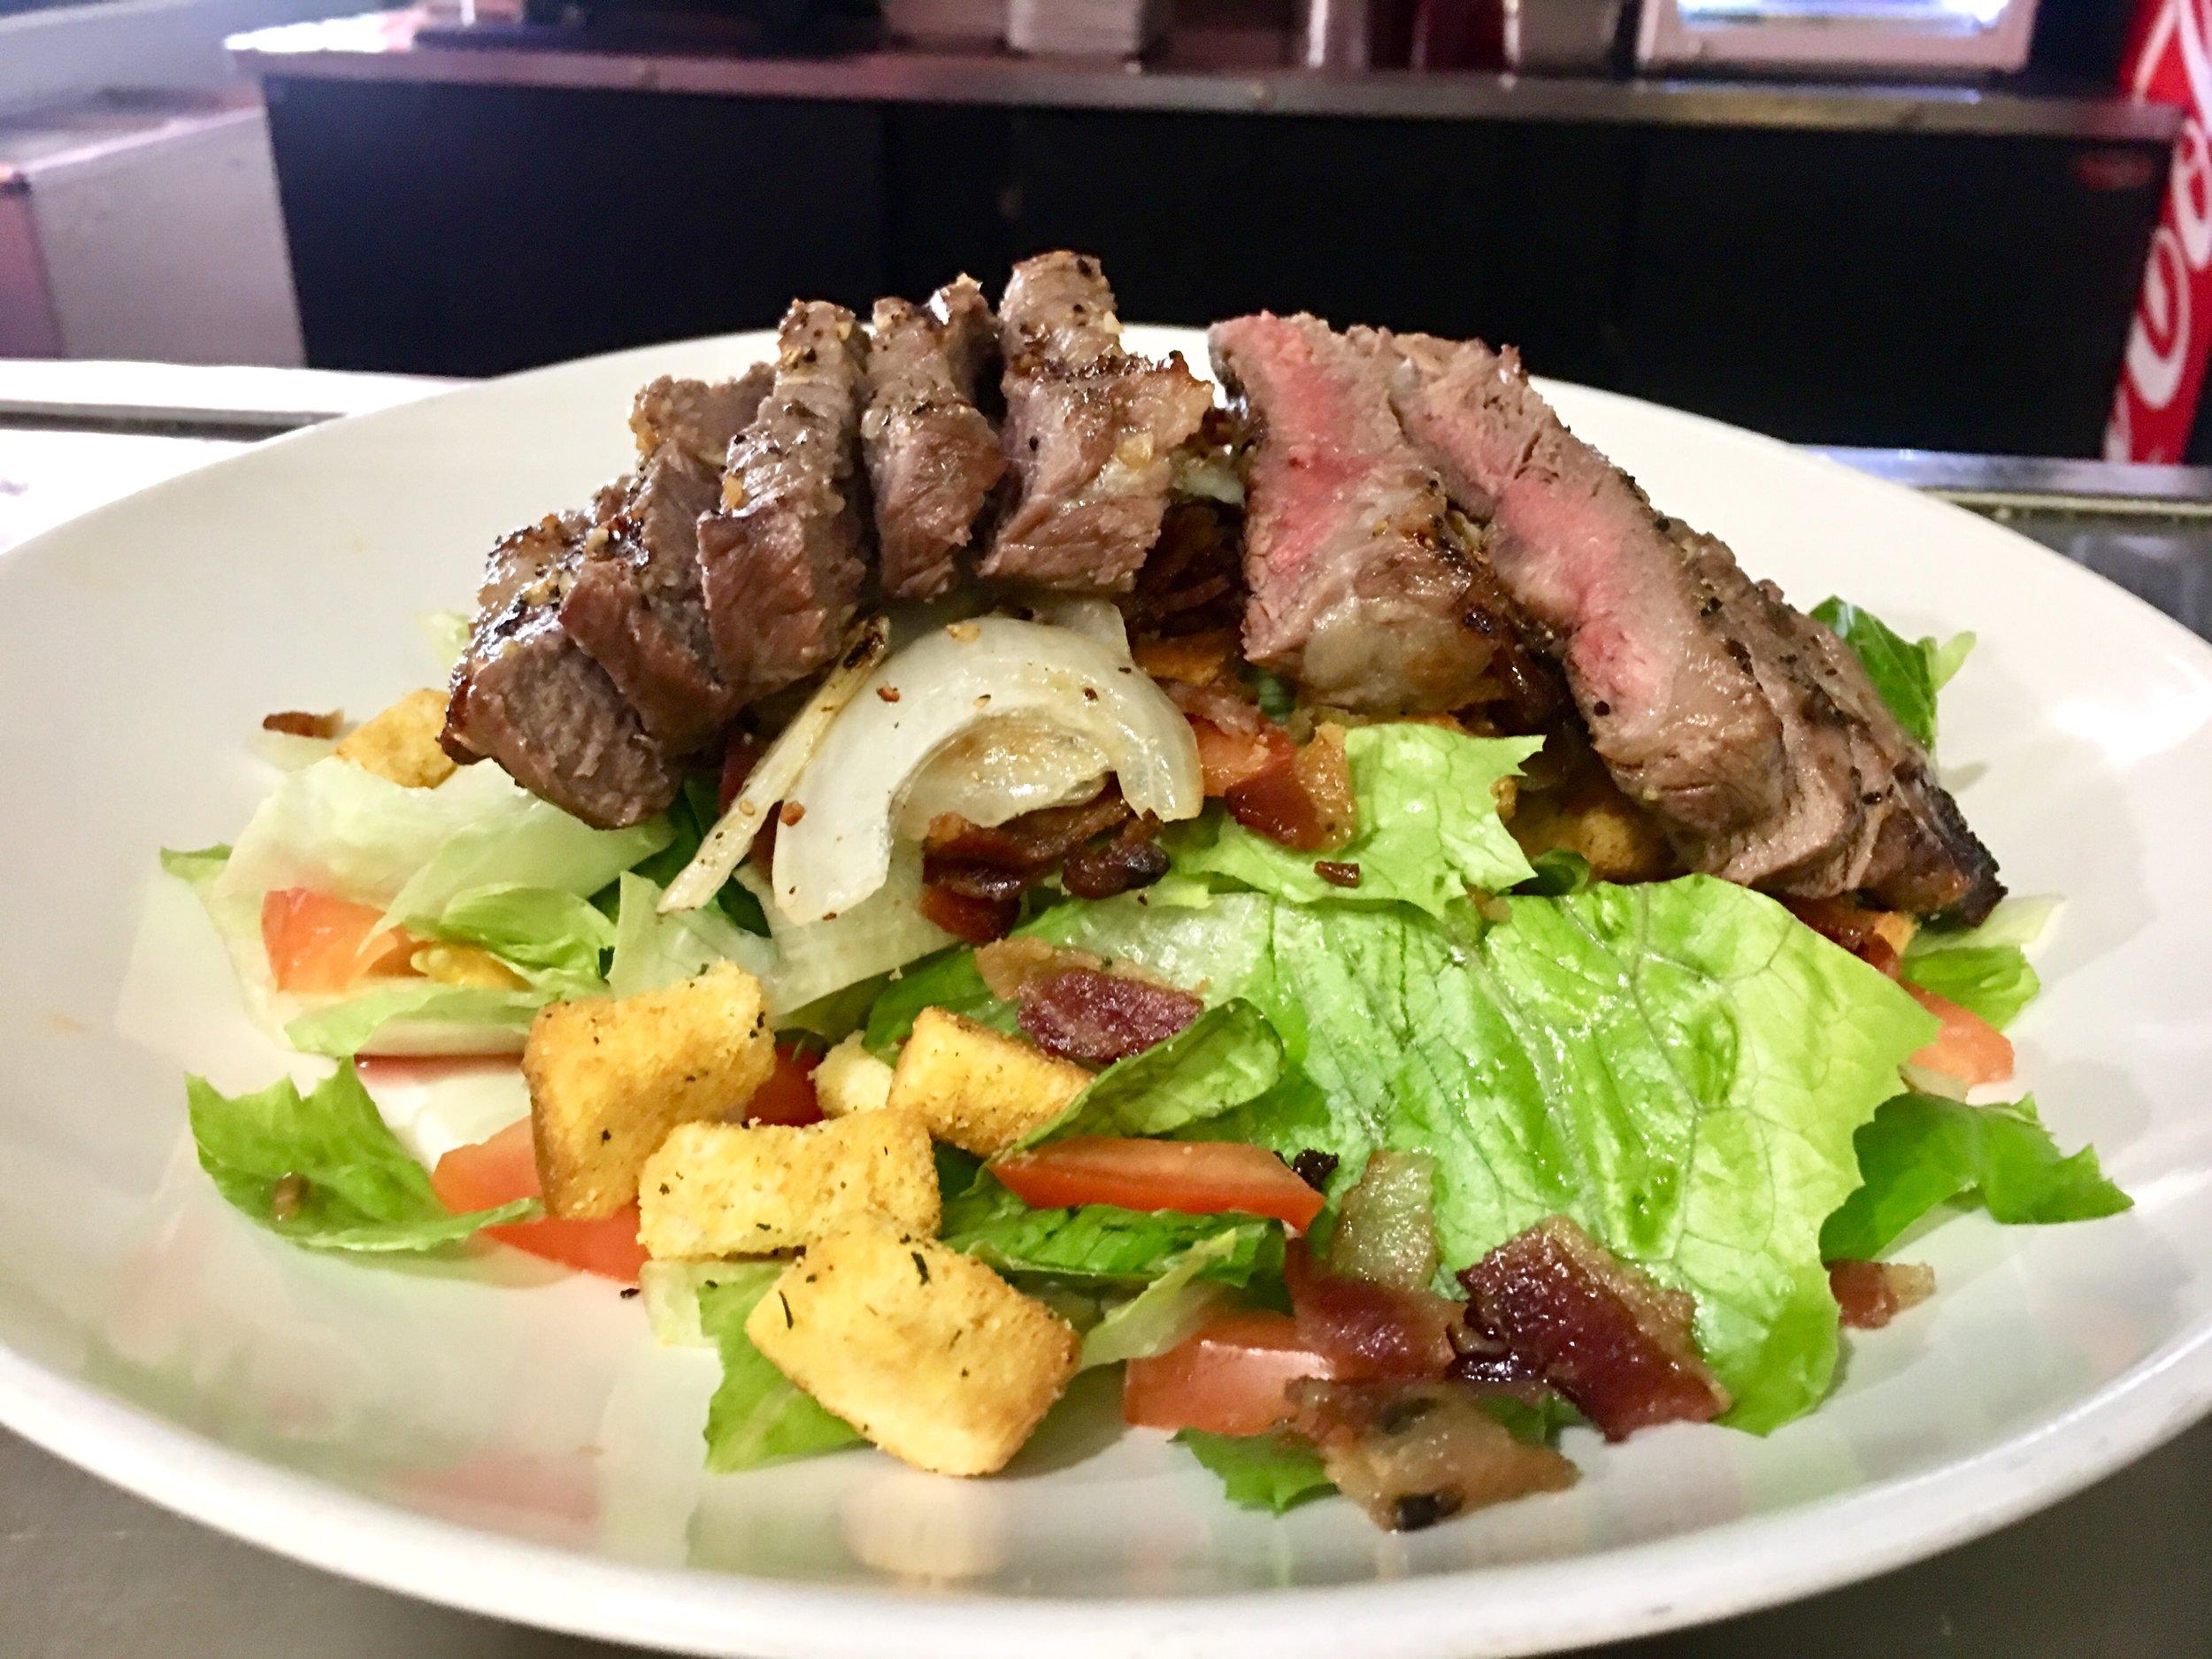 New York Steak Salad